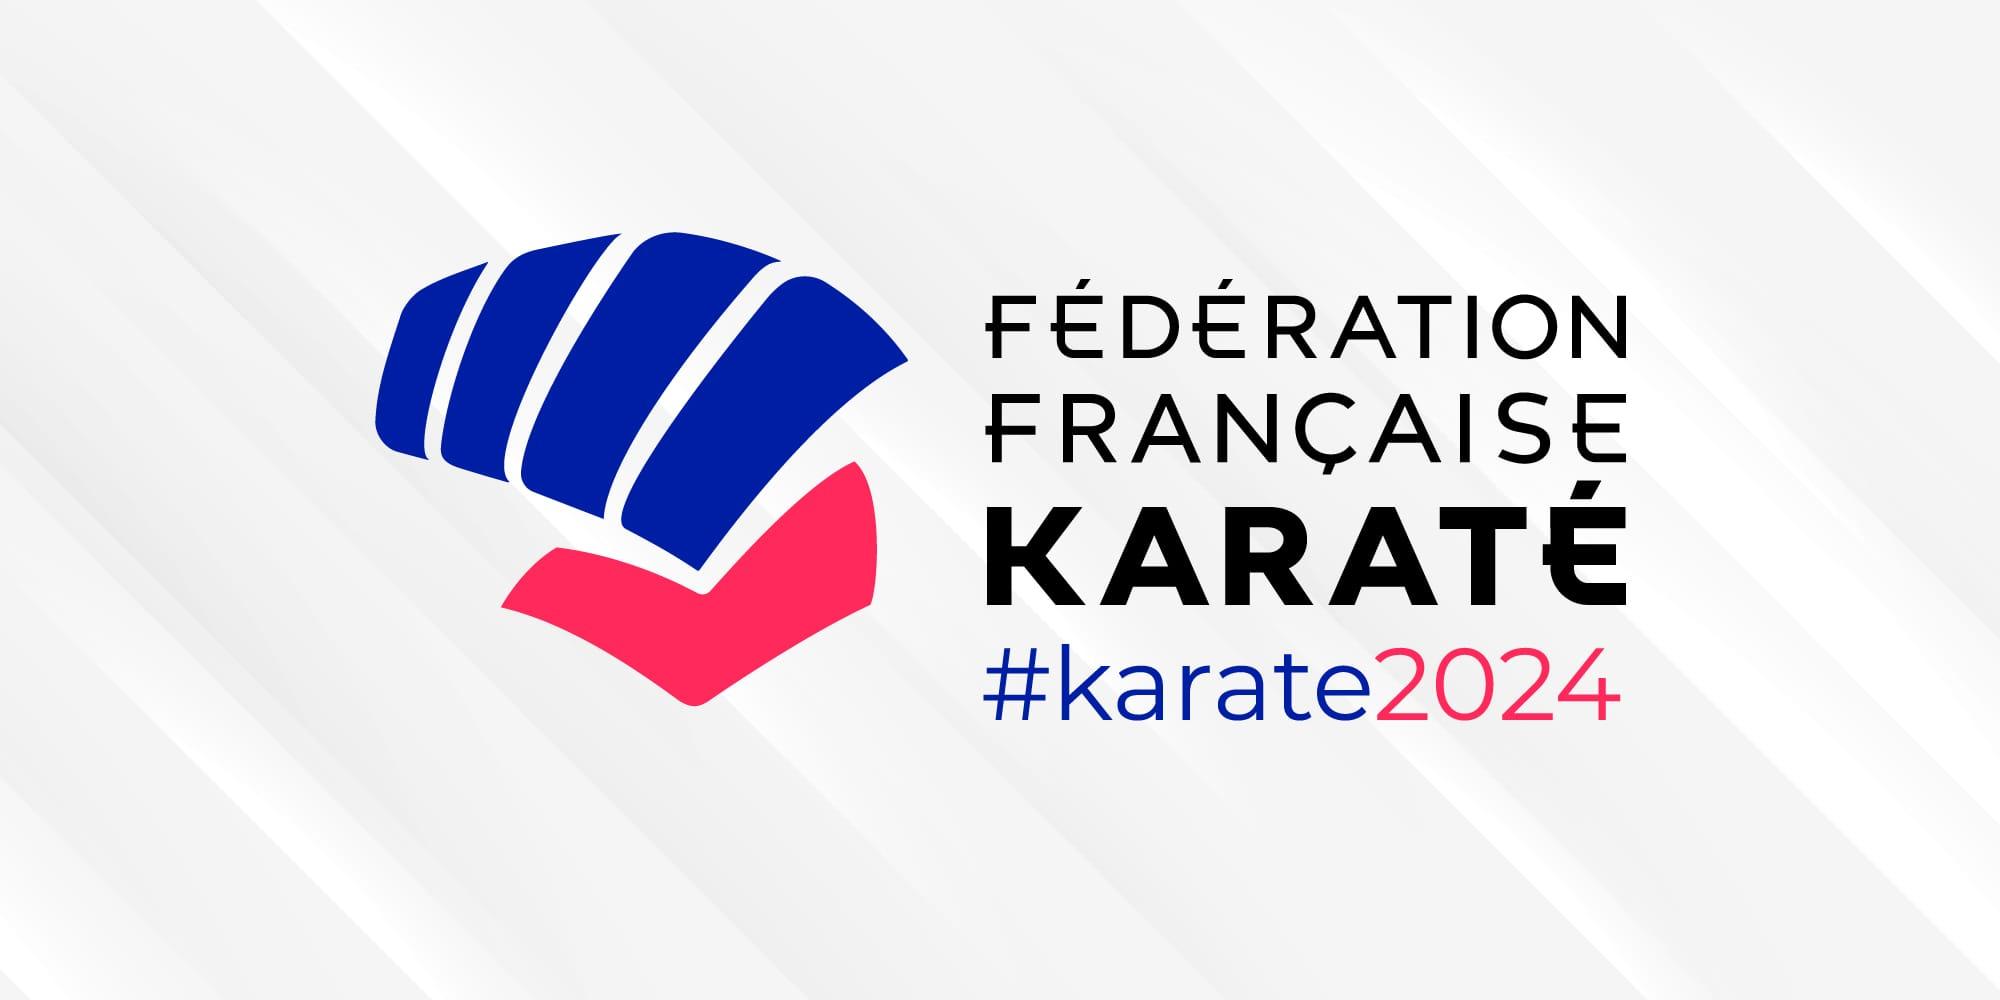 ESCR Kyokushinkai Karate